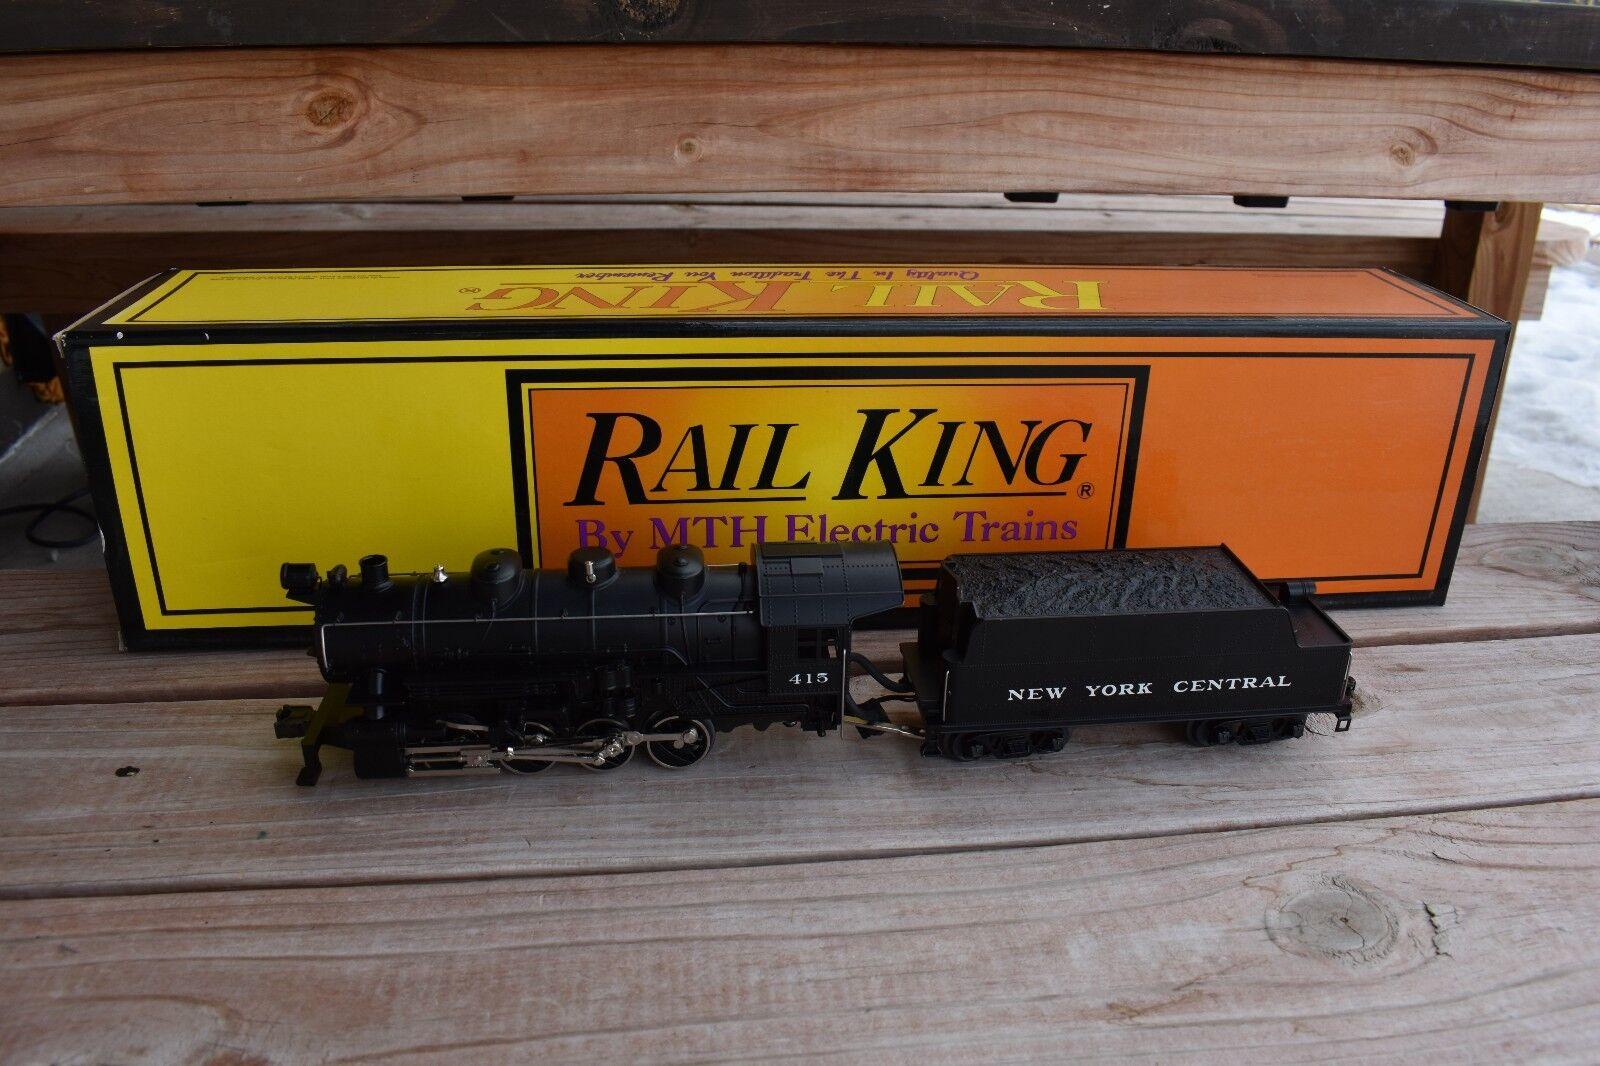 Mth Rail Rail Rail King New York central 0 - 8 - 0, projoosound 30 - 1123 - 1 66a